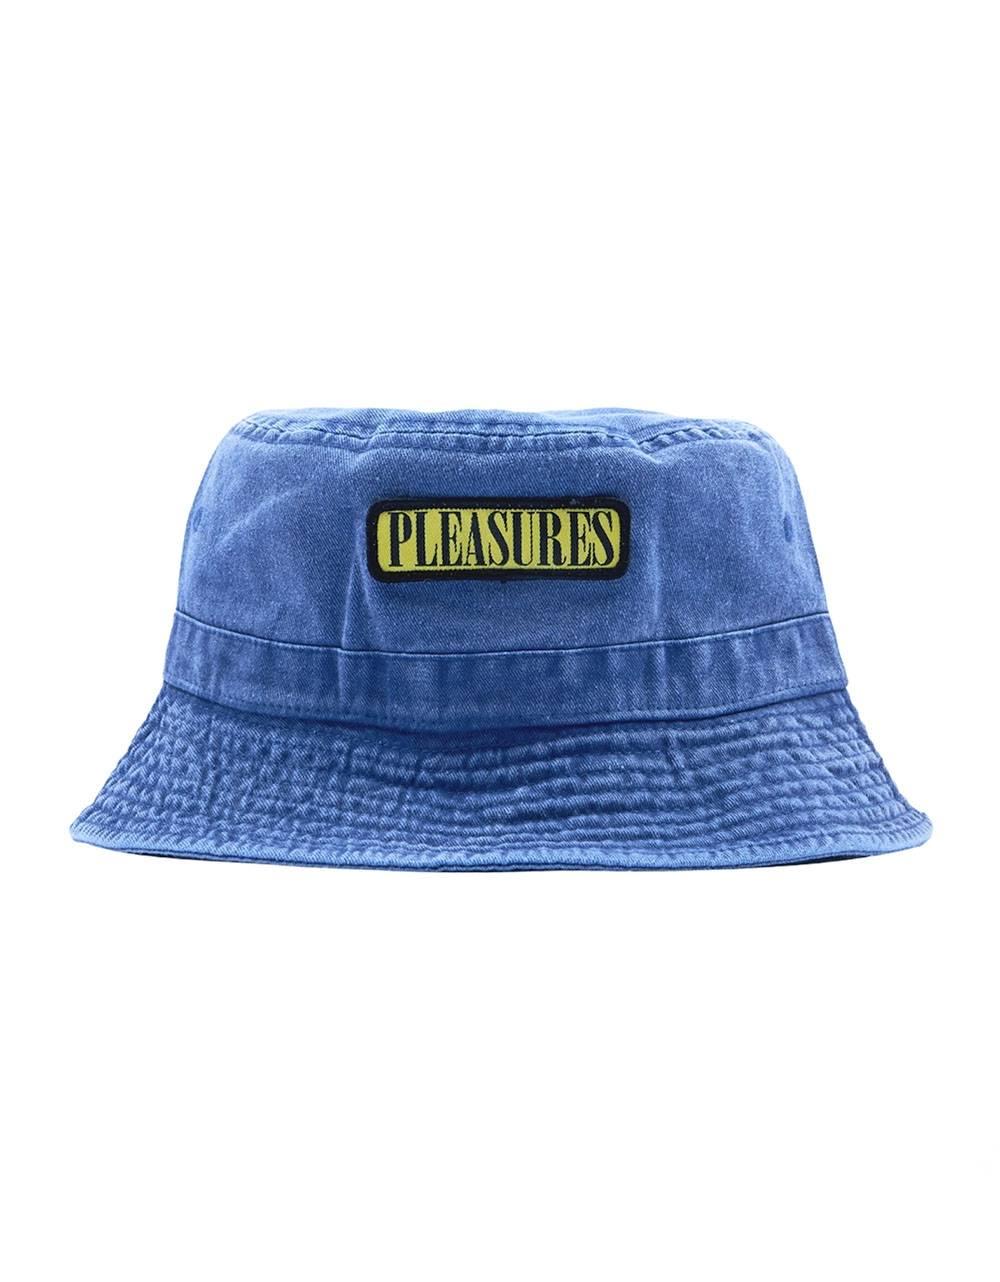 Pleasures Spank bucket hat - washed blue Pleasures Hat 48,36€